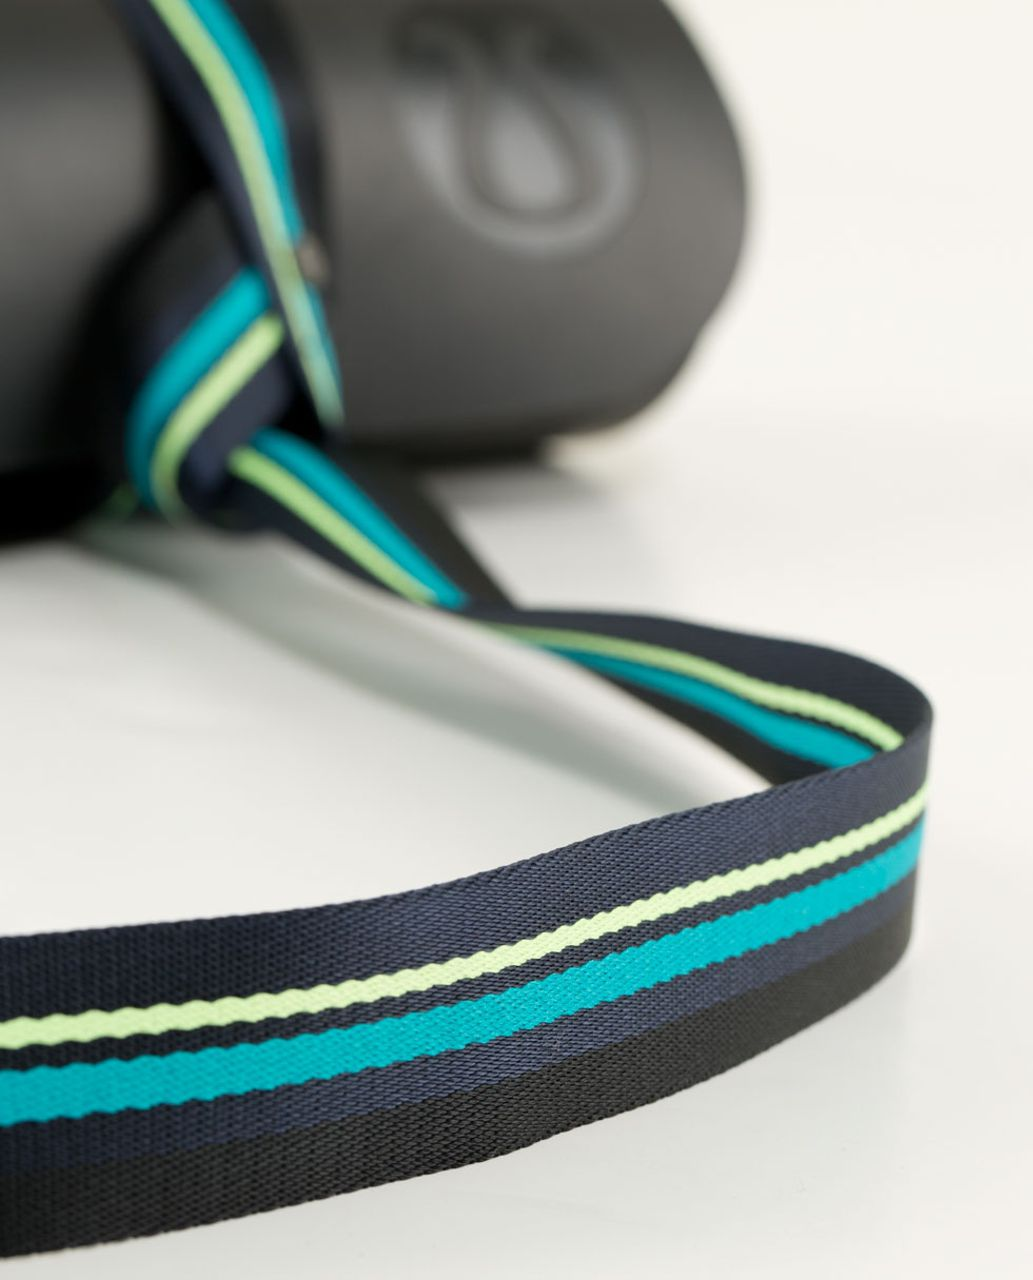 Lululemon Loop It Up Mat Strap - Black / Inkwell / Clear Mint / Surge